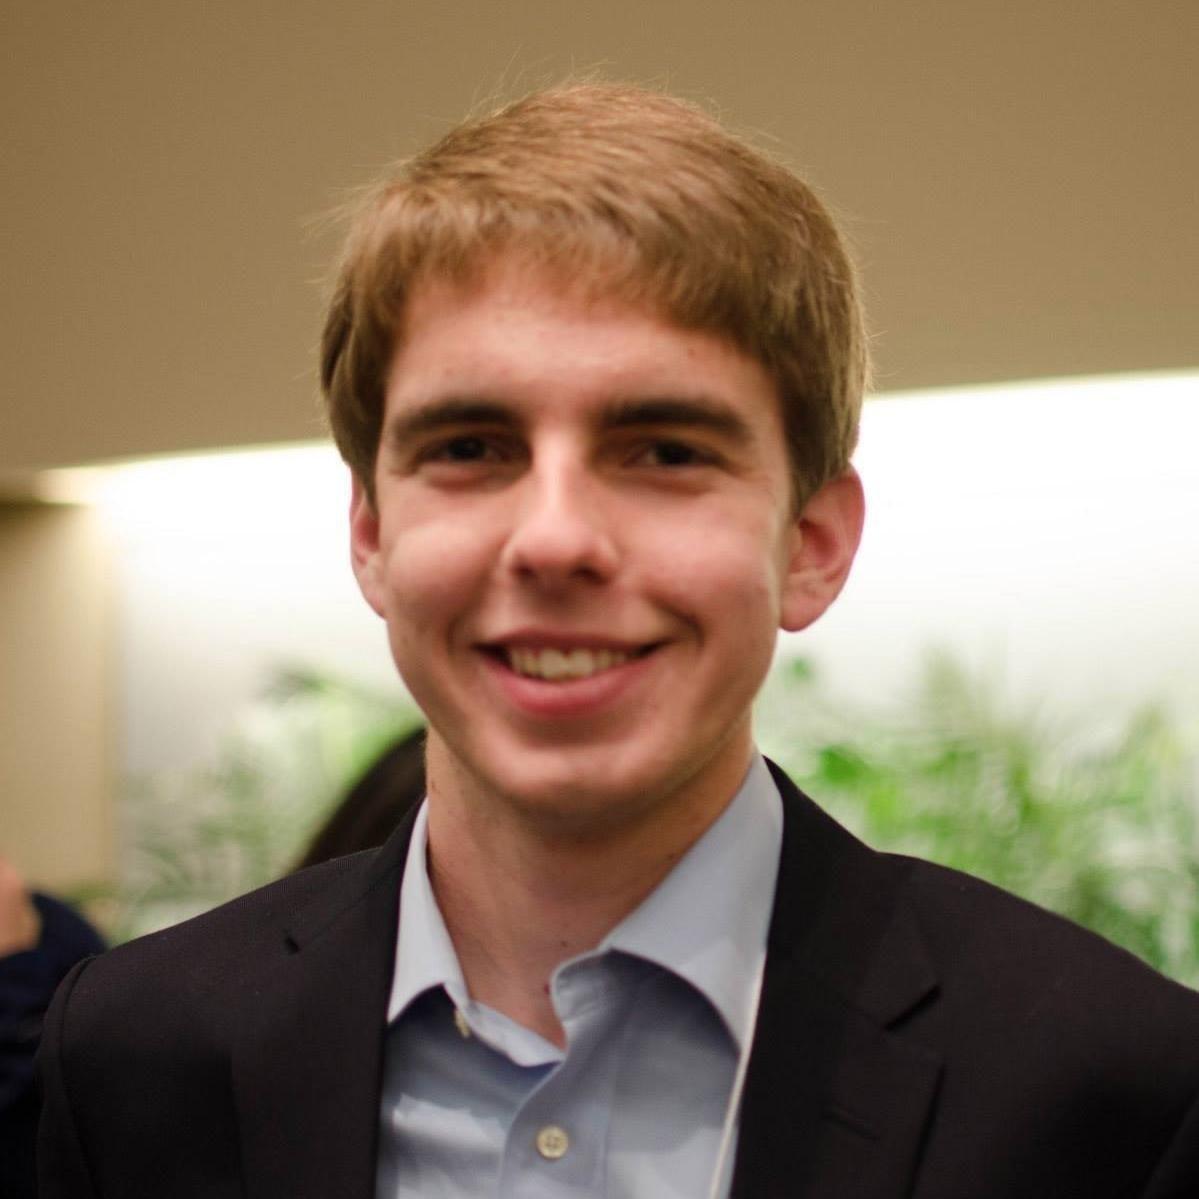 Matthew Dierker